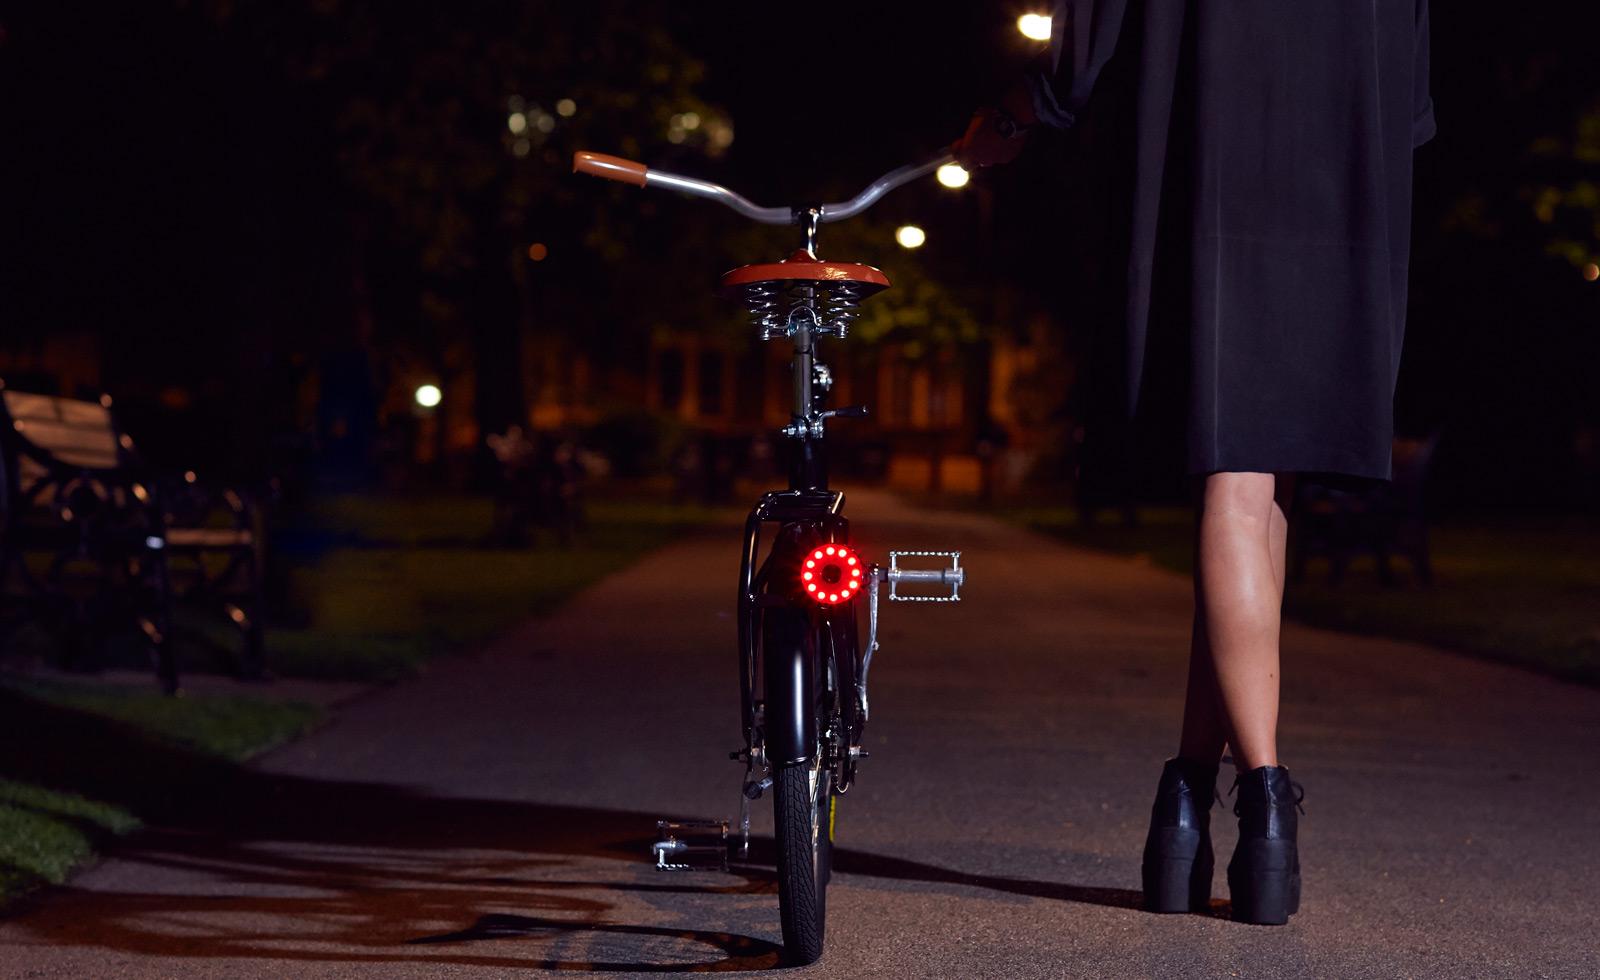 double 0 lights on back of dutch bike